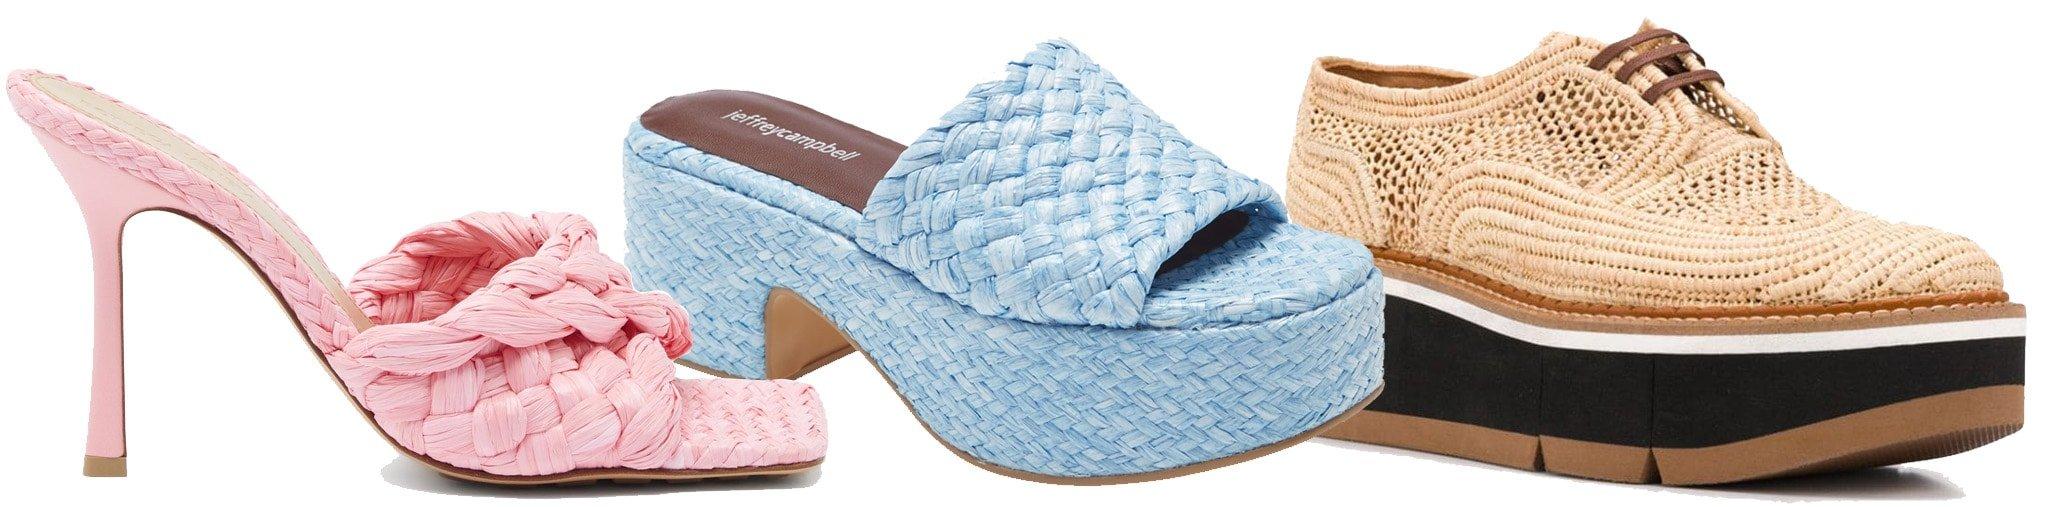 Bottega Veneta Stretch Intrecciato raffia mules, Jeffrey CampbellShindy platform slide sandal, Clergerie raffia lace-up shoes